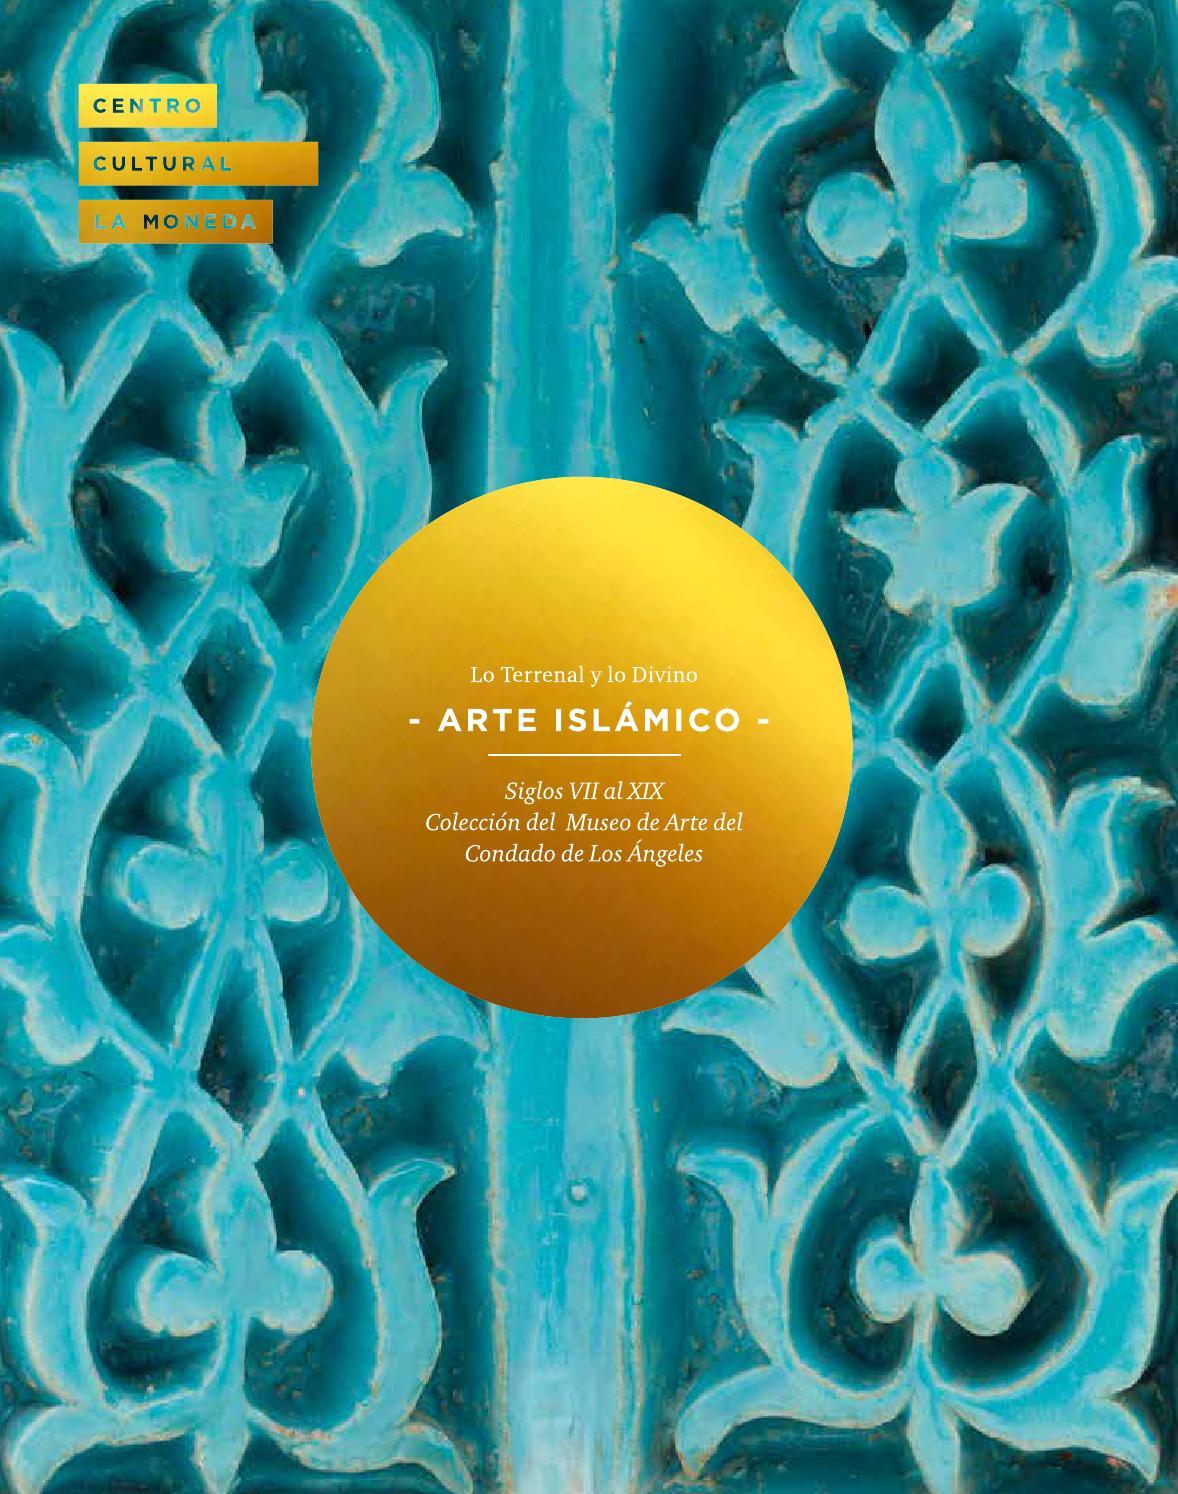 Catálogo Arte Islámico by Centro Cultural La Moneda - issuu